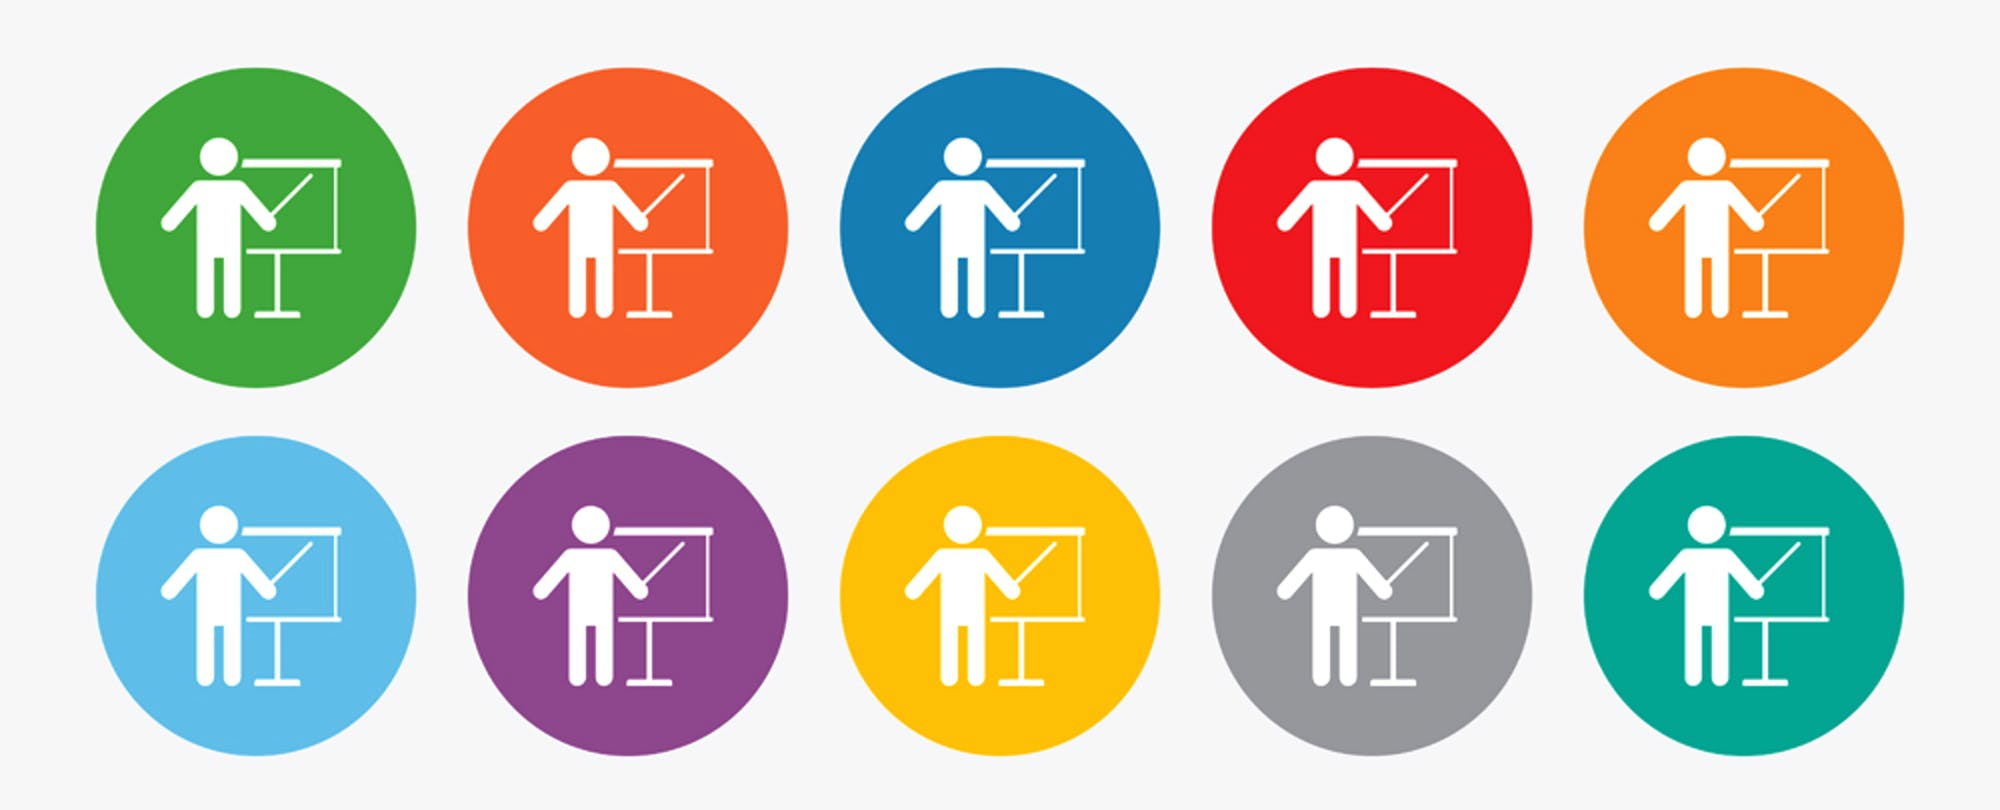 Can You Design a Better Teacher Icon?